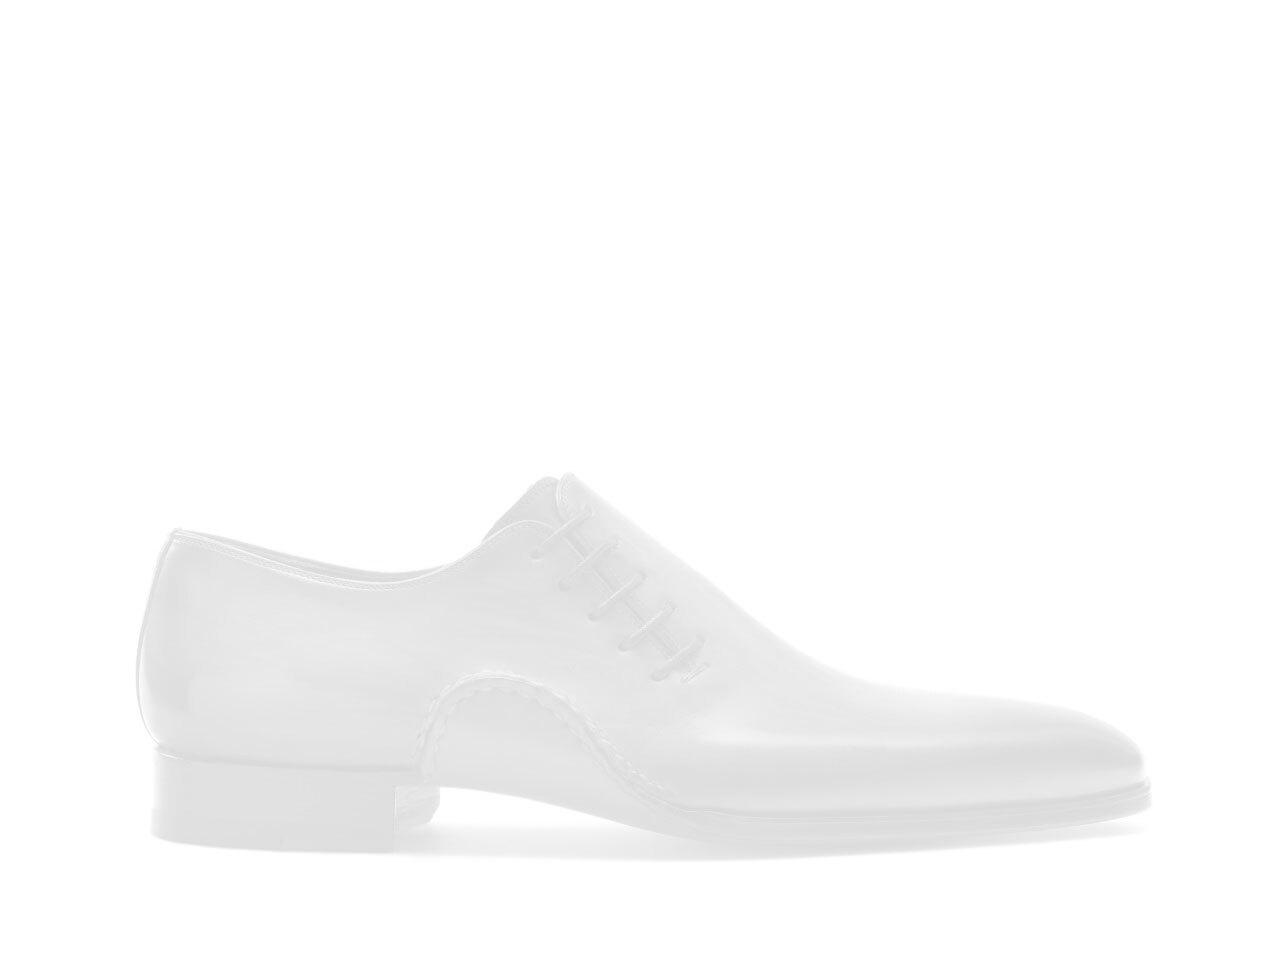 Sole of the Magnanni Marco Wide Cuero Men's Single Monk Strap Shoes